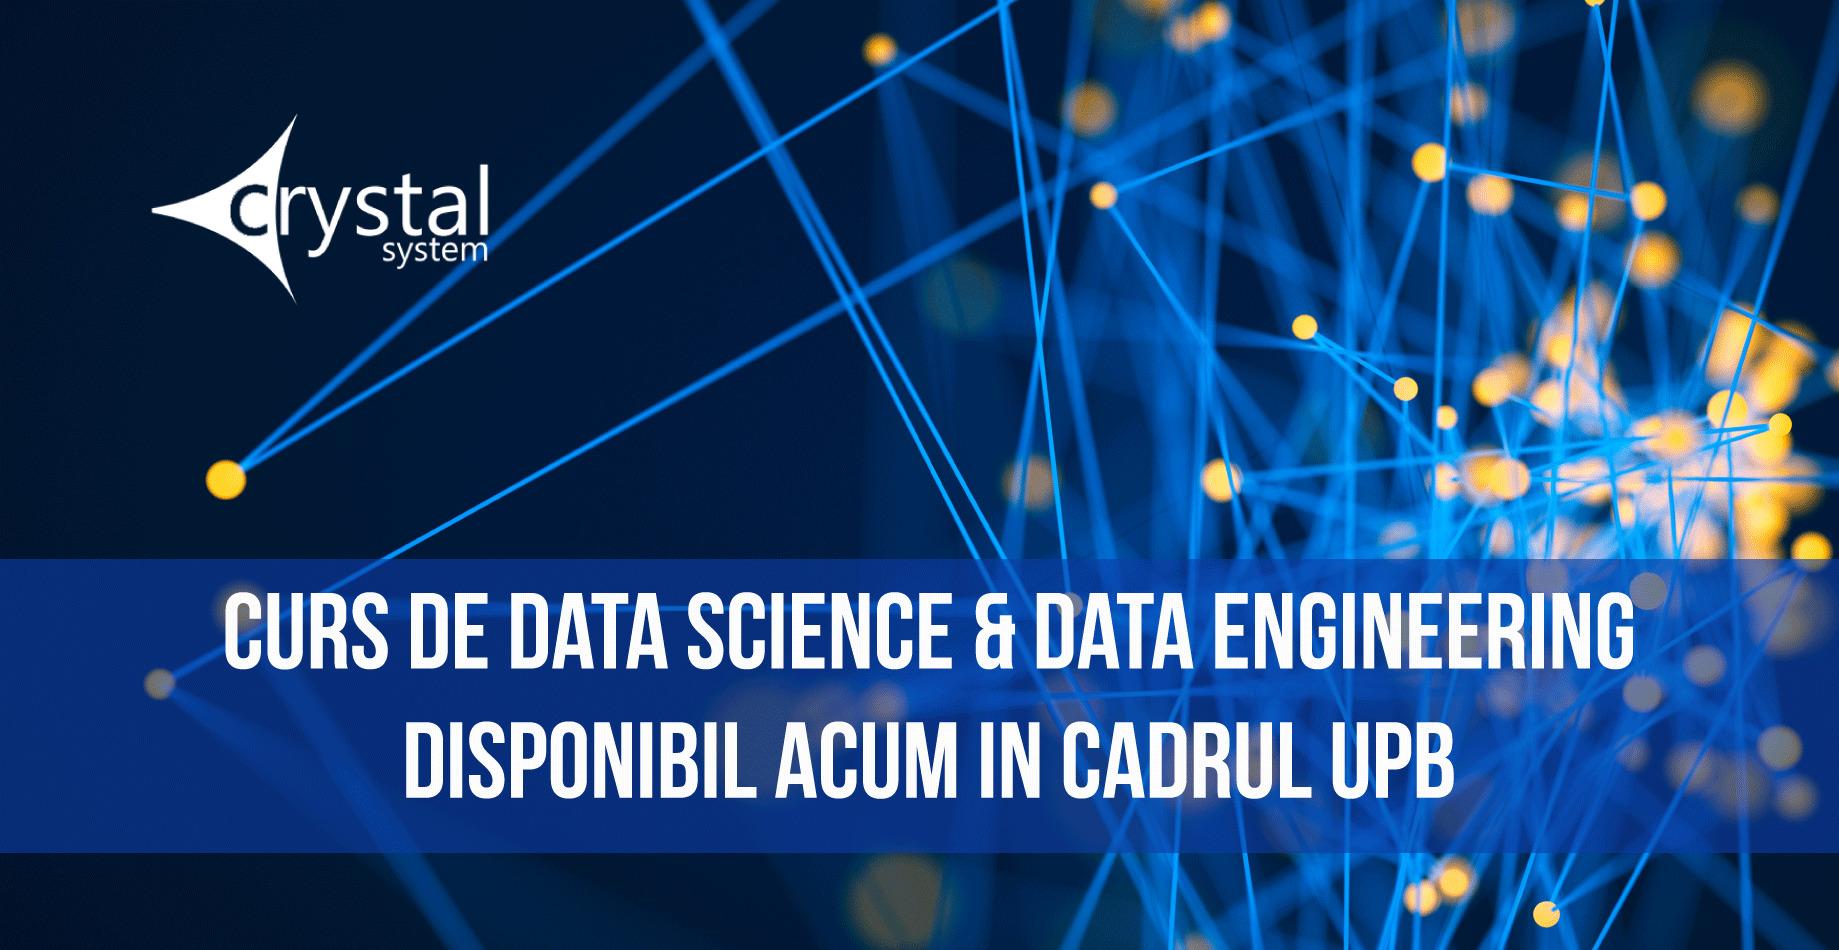 CURS DE DATA SCIENCE & DATA ENGINEERING DISPONIBIL IN CADRUL UPB